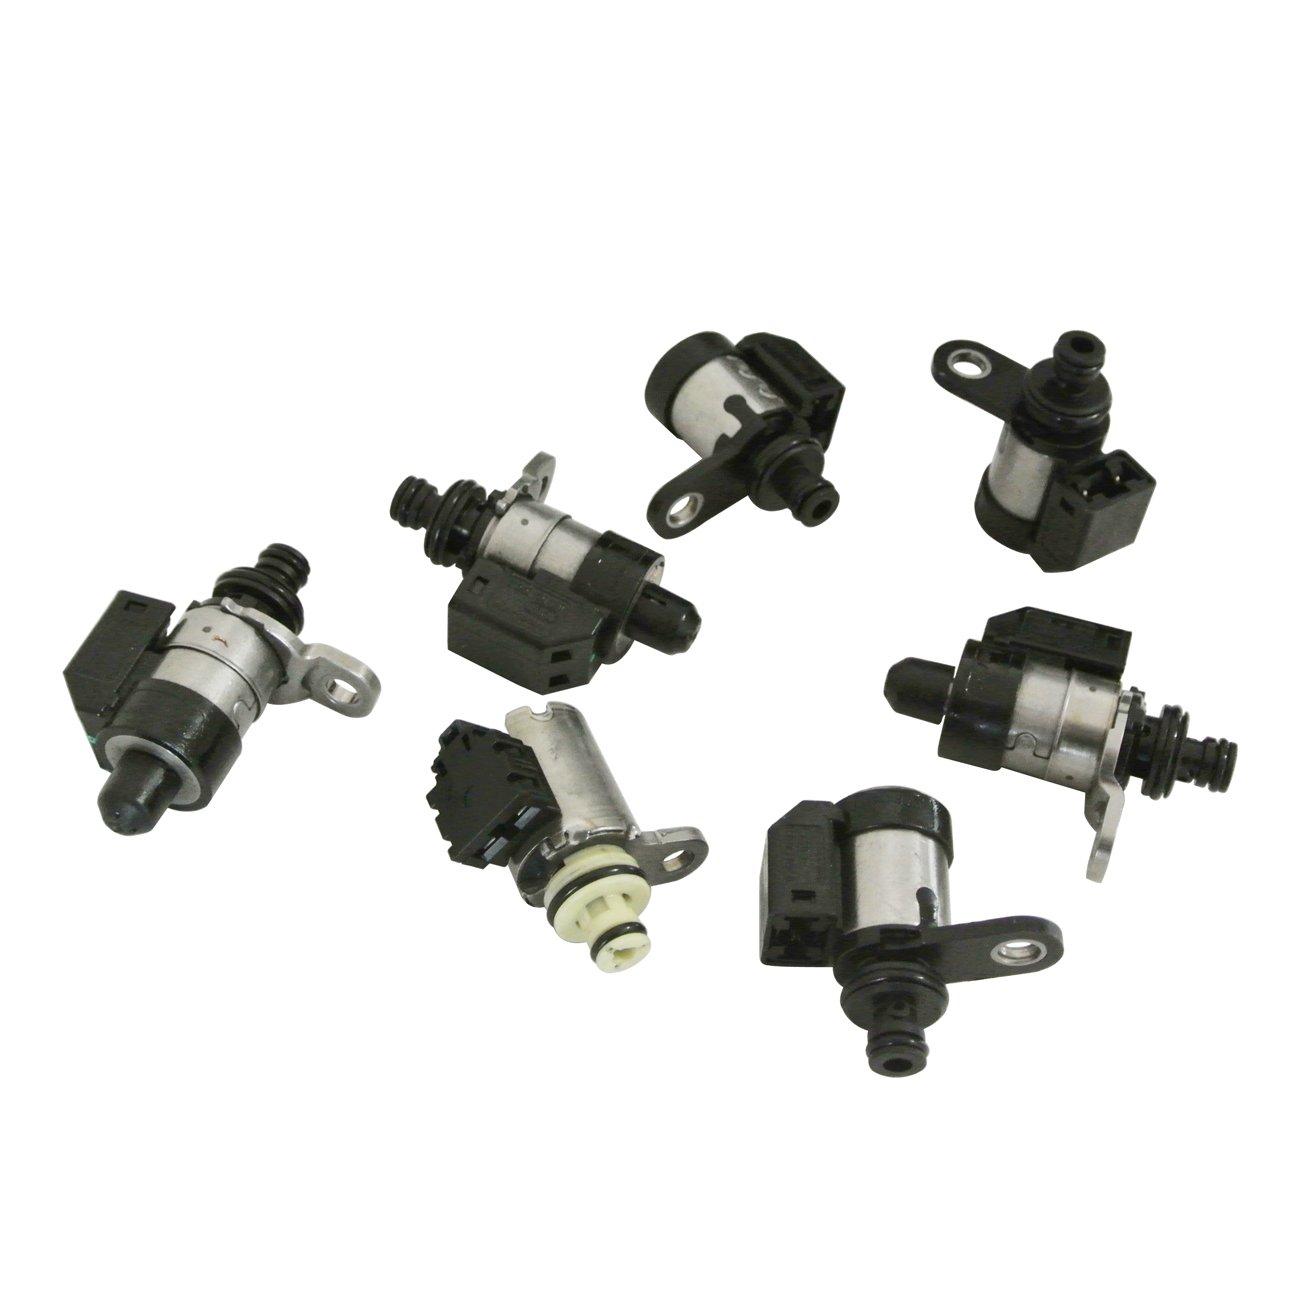 Amazon.com: JRL Transmission Line Pressure Control Solenoid Fit NISSAN ARMADA DIRECT CLUTCH: Automotive